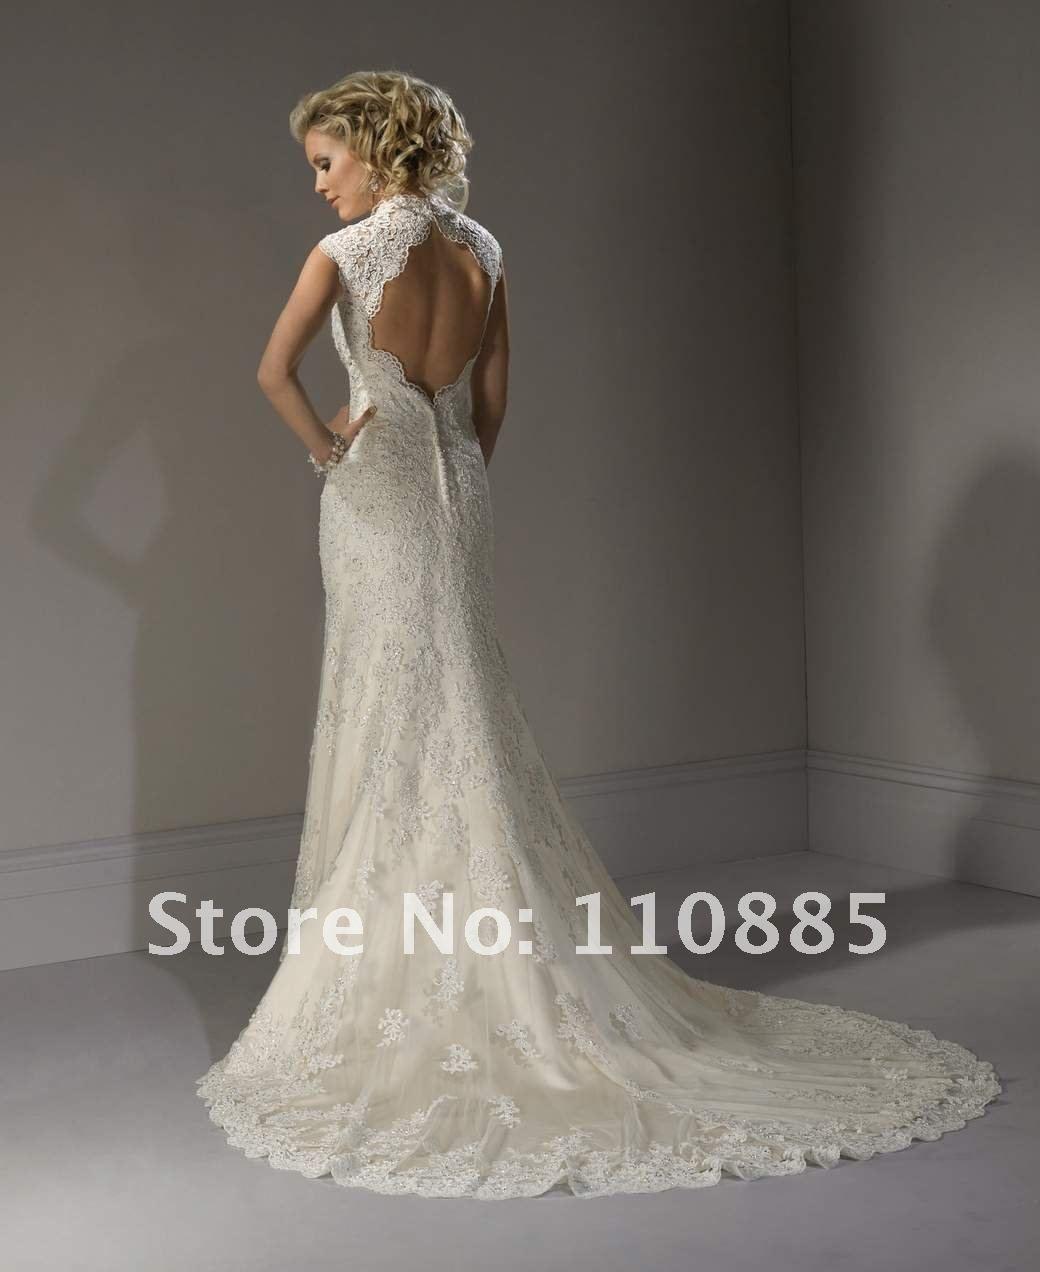 Cheap Wedding Dresses Madison Wi: Keyhole Back Wedding Dress - Google Search